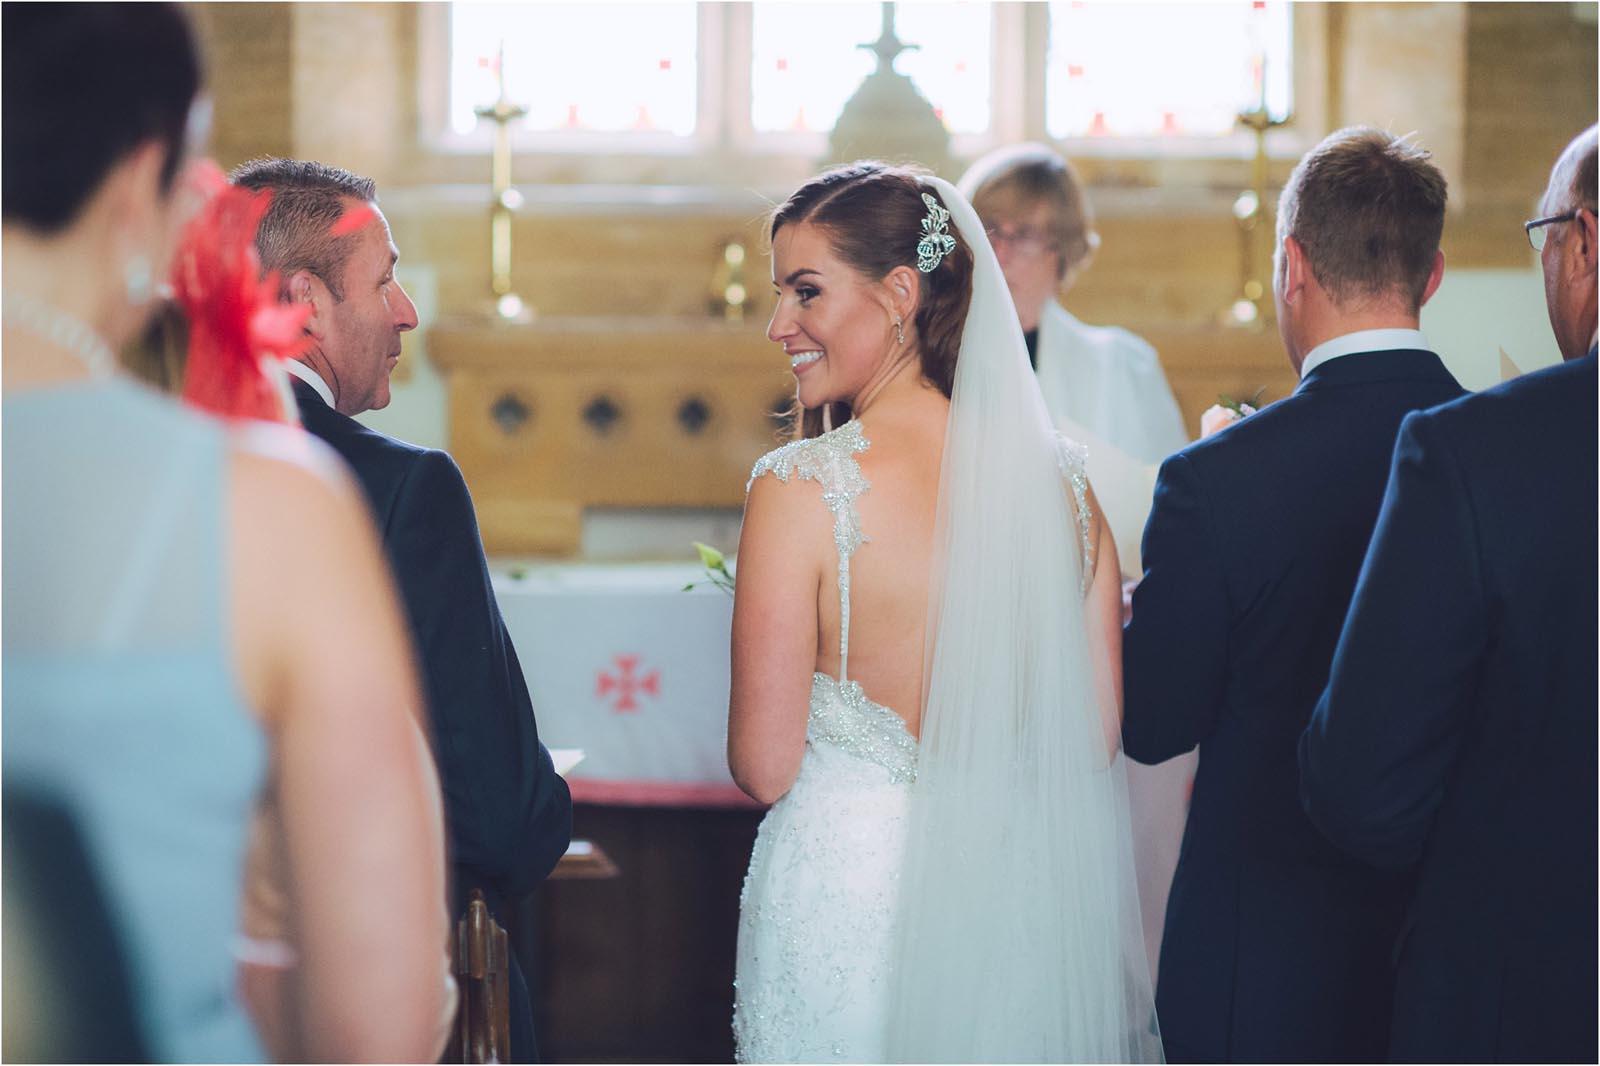 Simon biffen wedding photography 0062